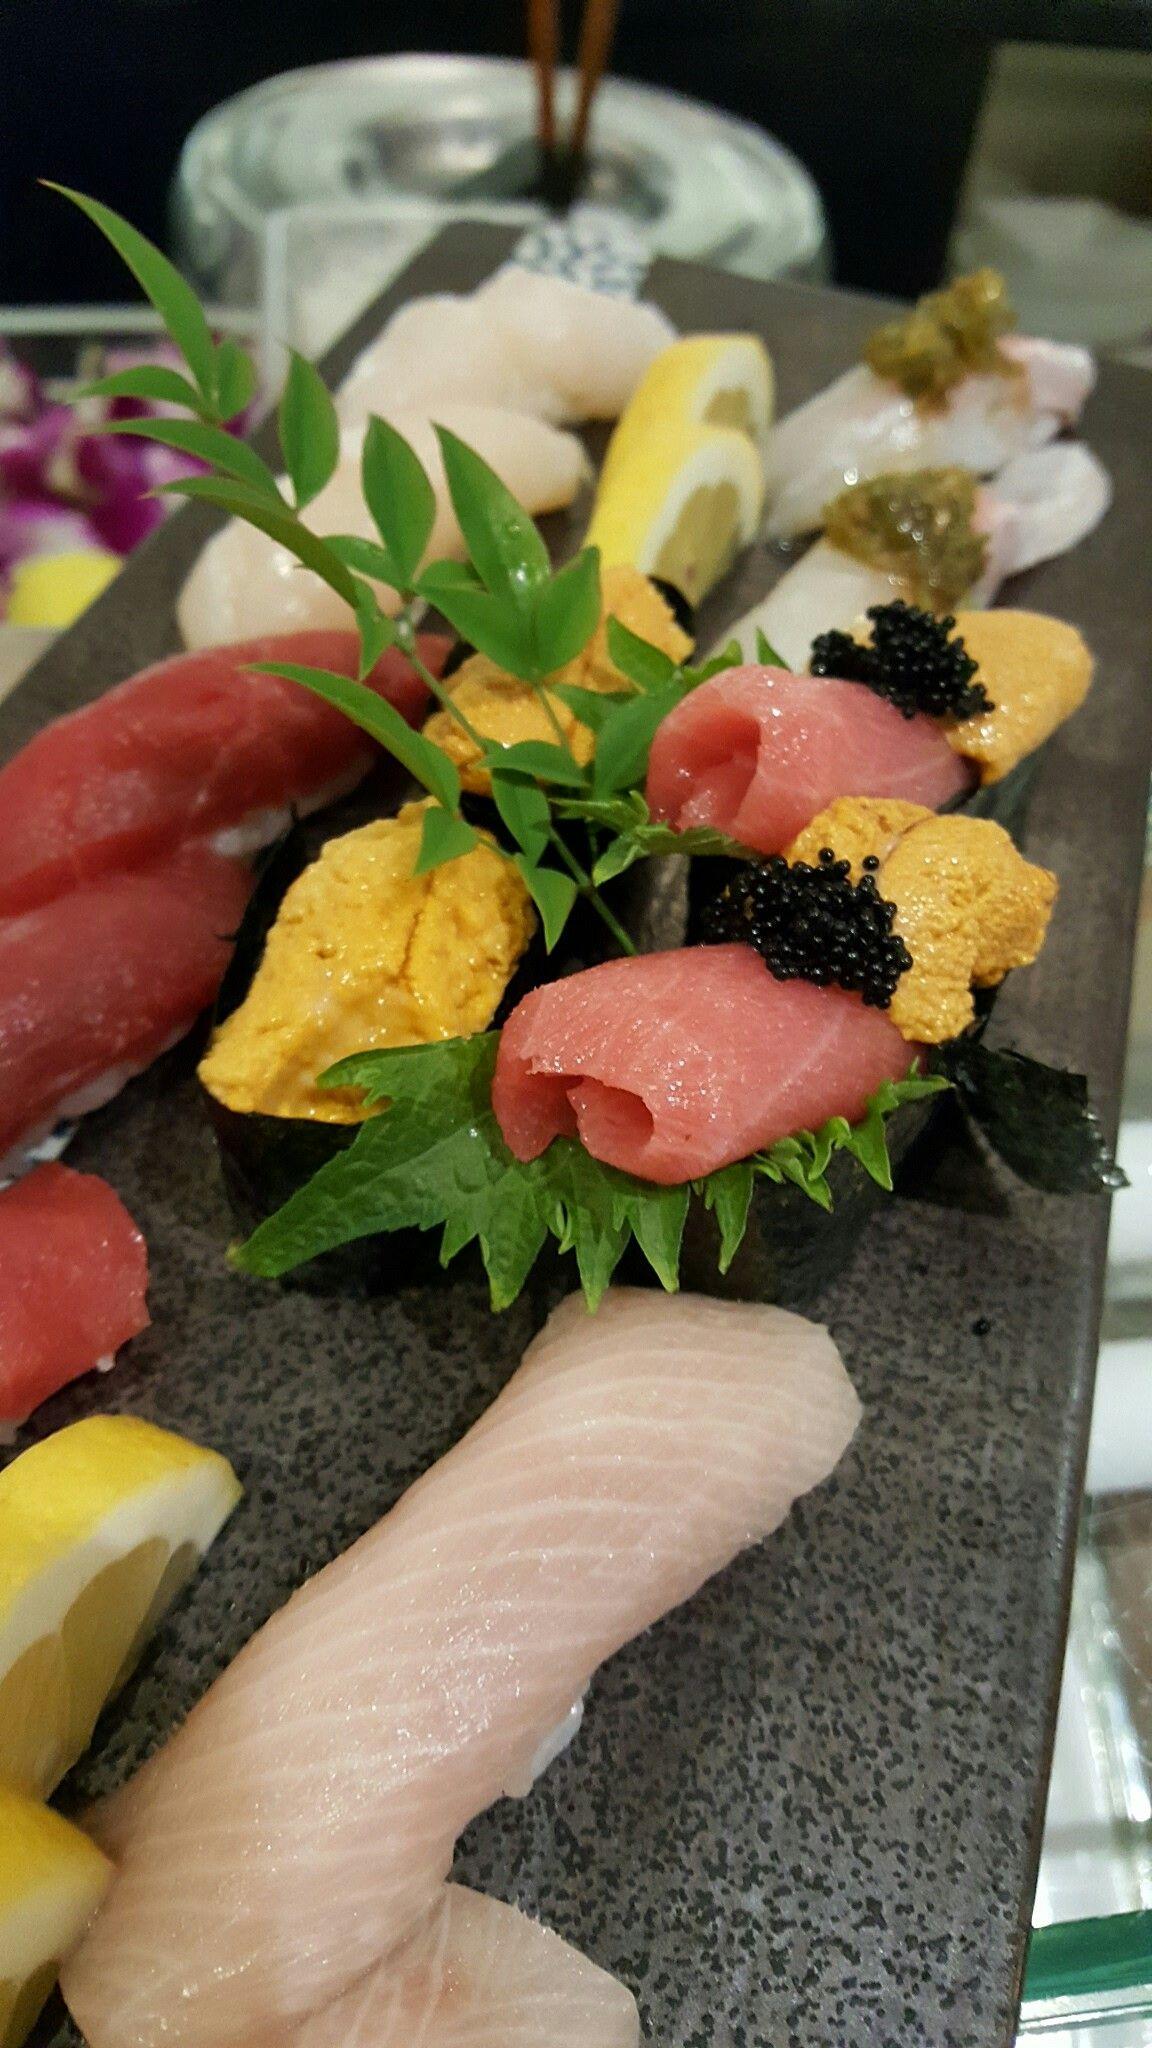 Pin by damon anthony on restaurant food sushi yummy